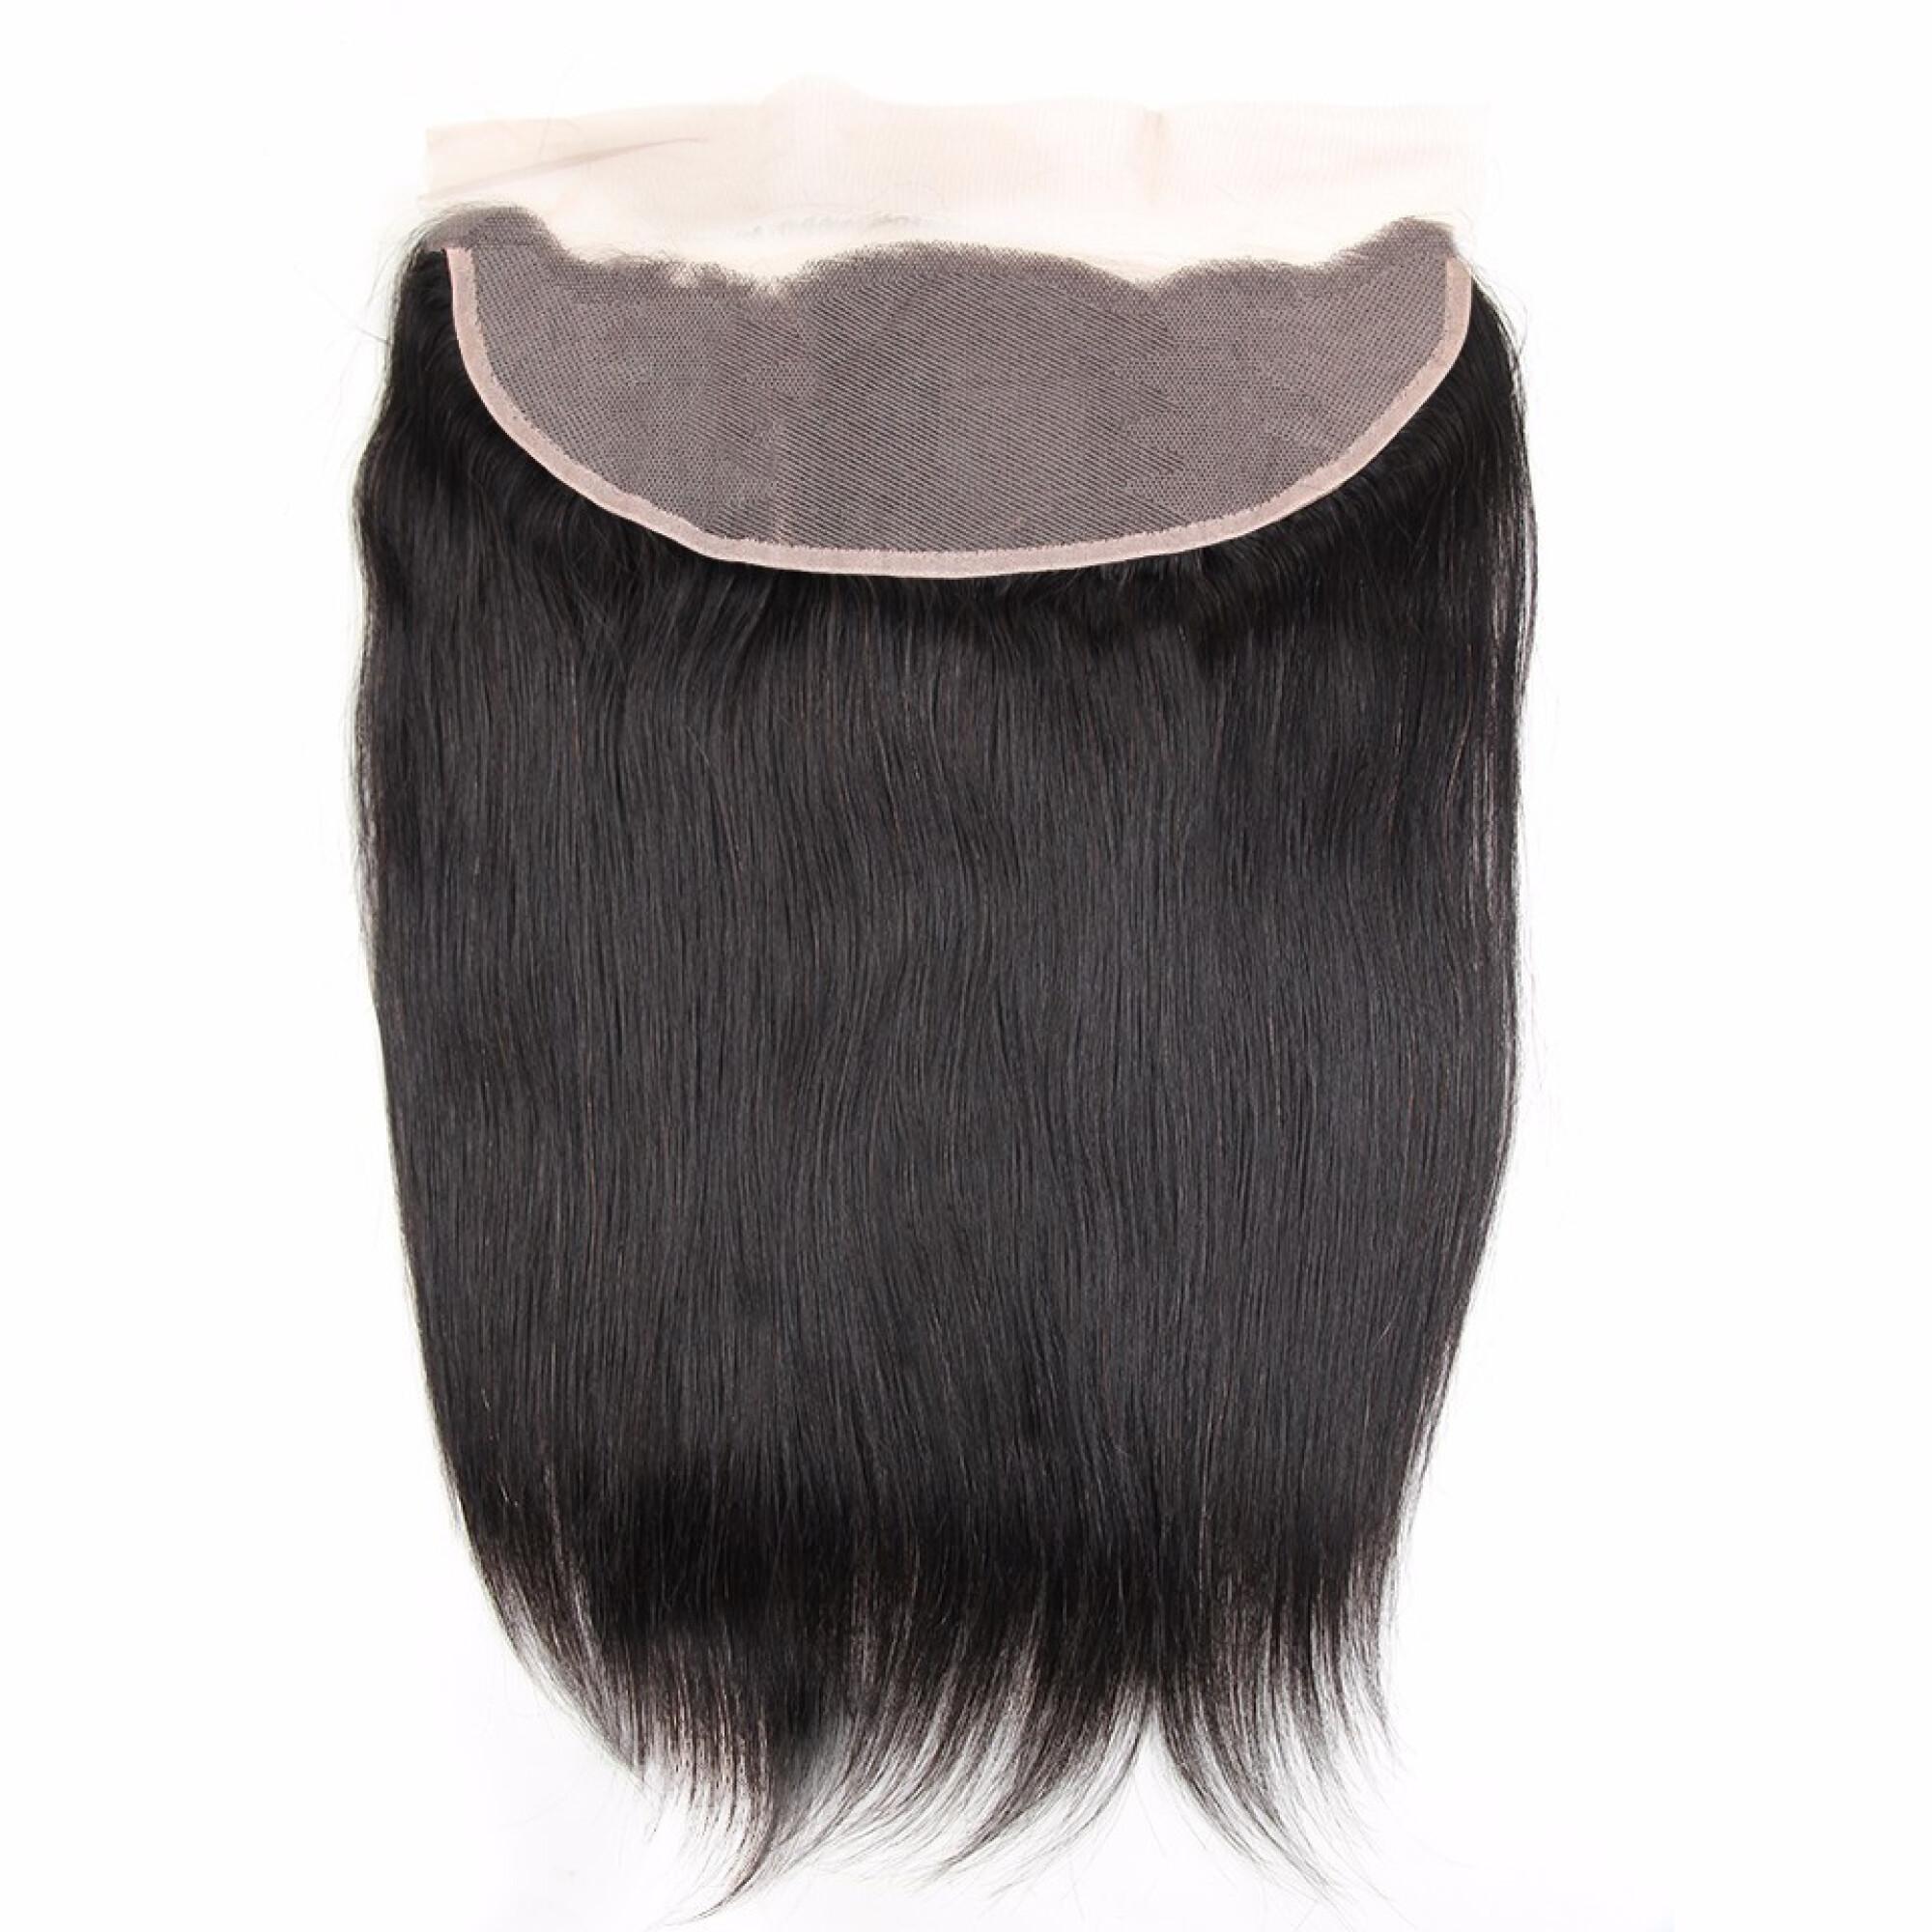 "Amazing Star Brazilian Straight Hair Frontal Closure Free Part Virgin Human Hair, 12"""